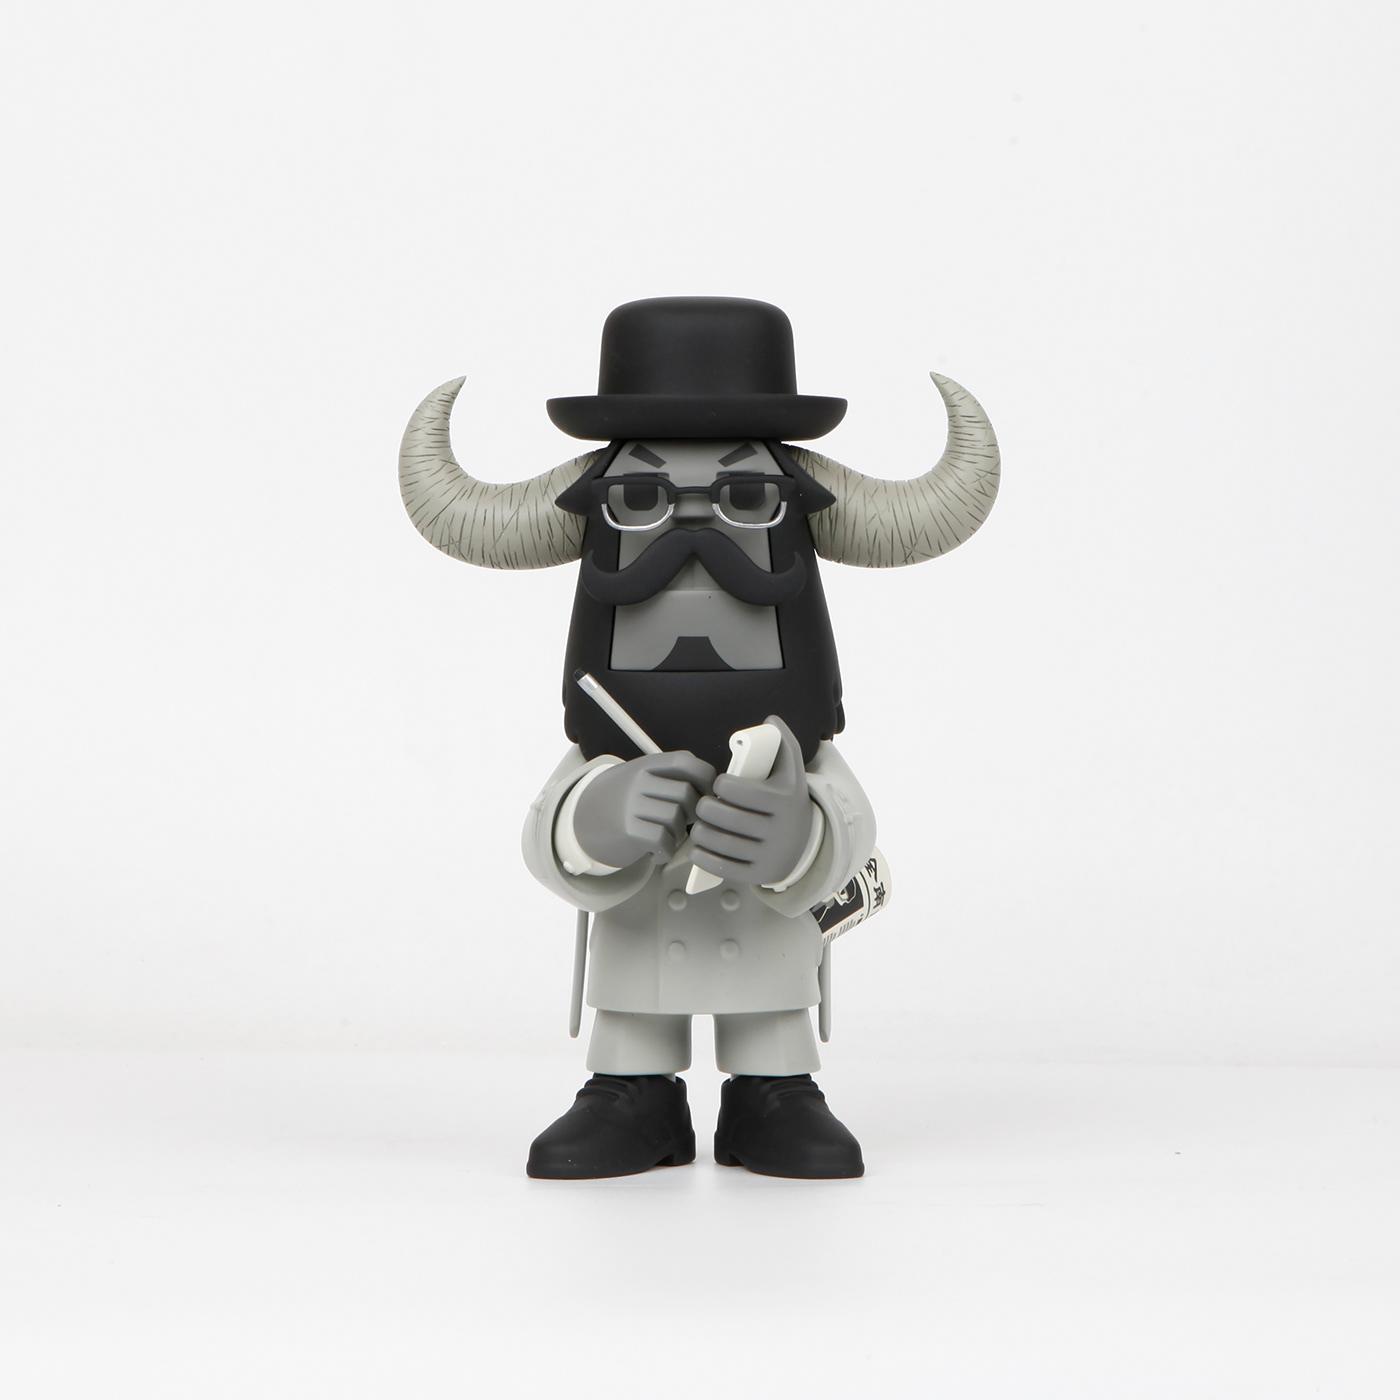 Image may contain: hat, cartoon and cowboy hat